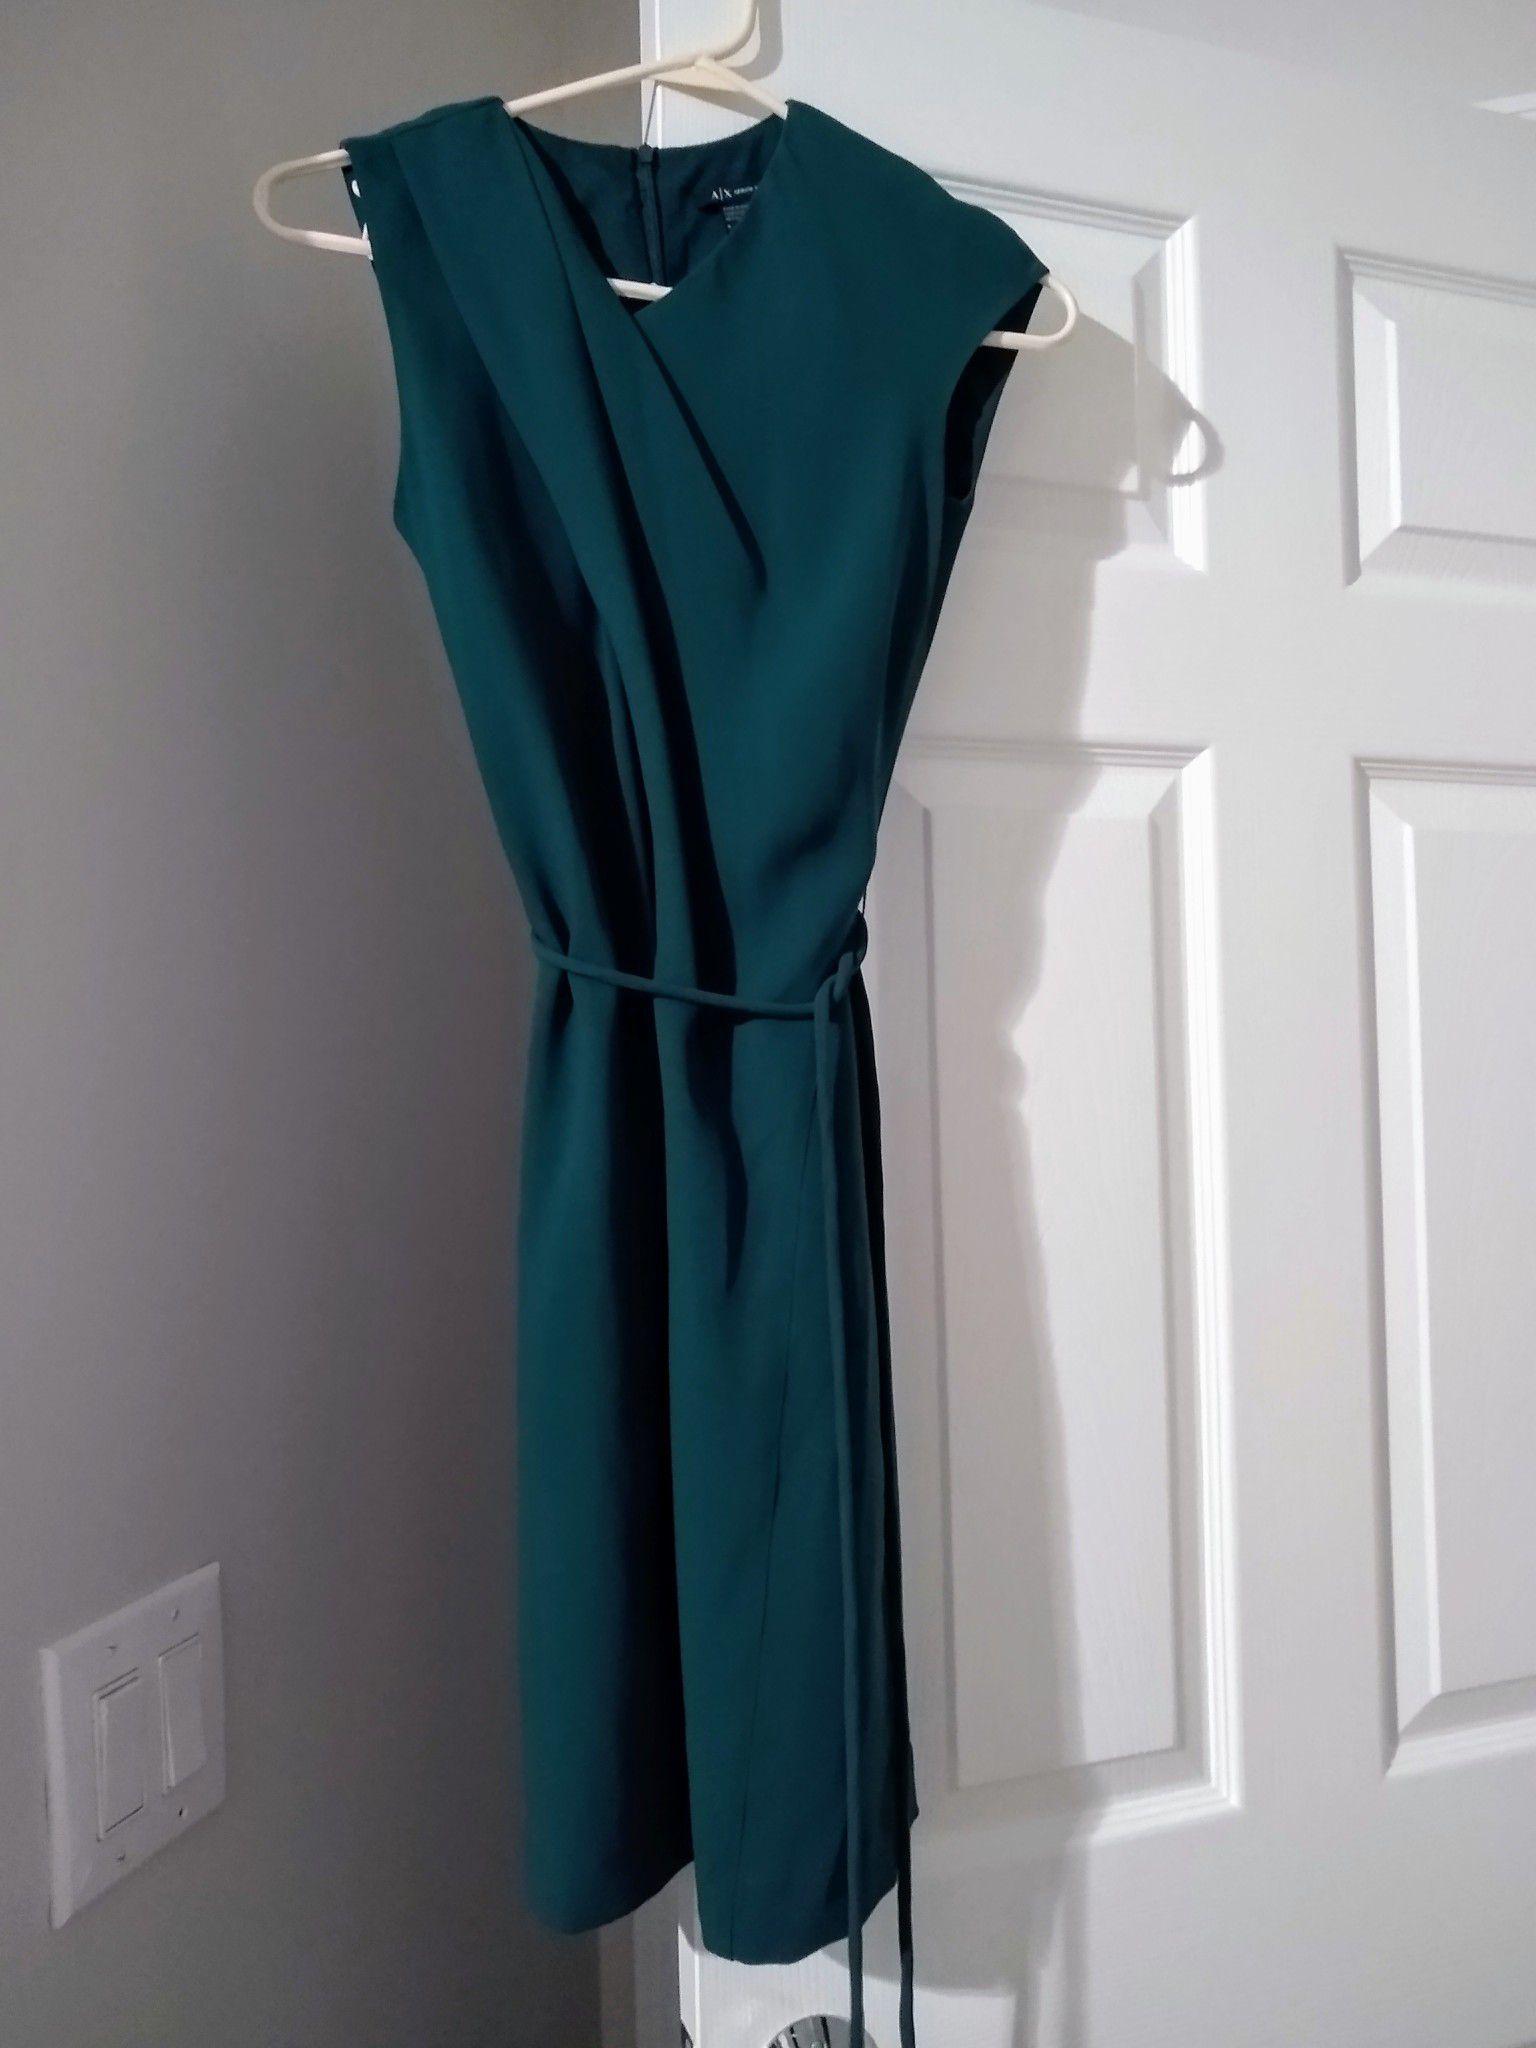 Armani Exchange Teal Dress Size 0